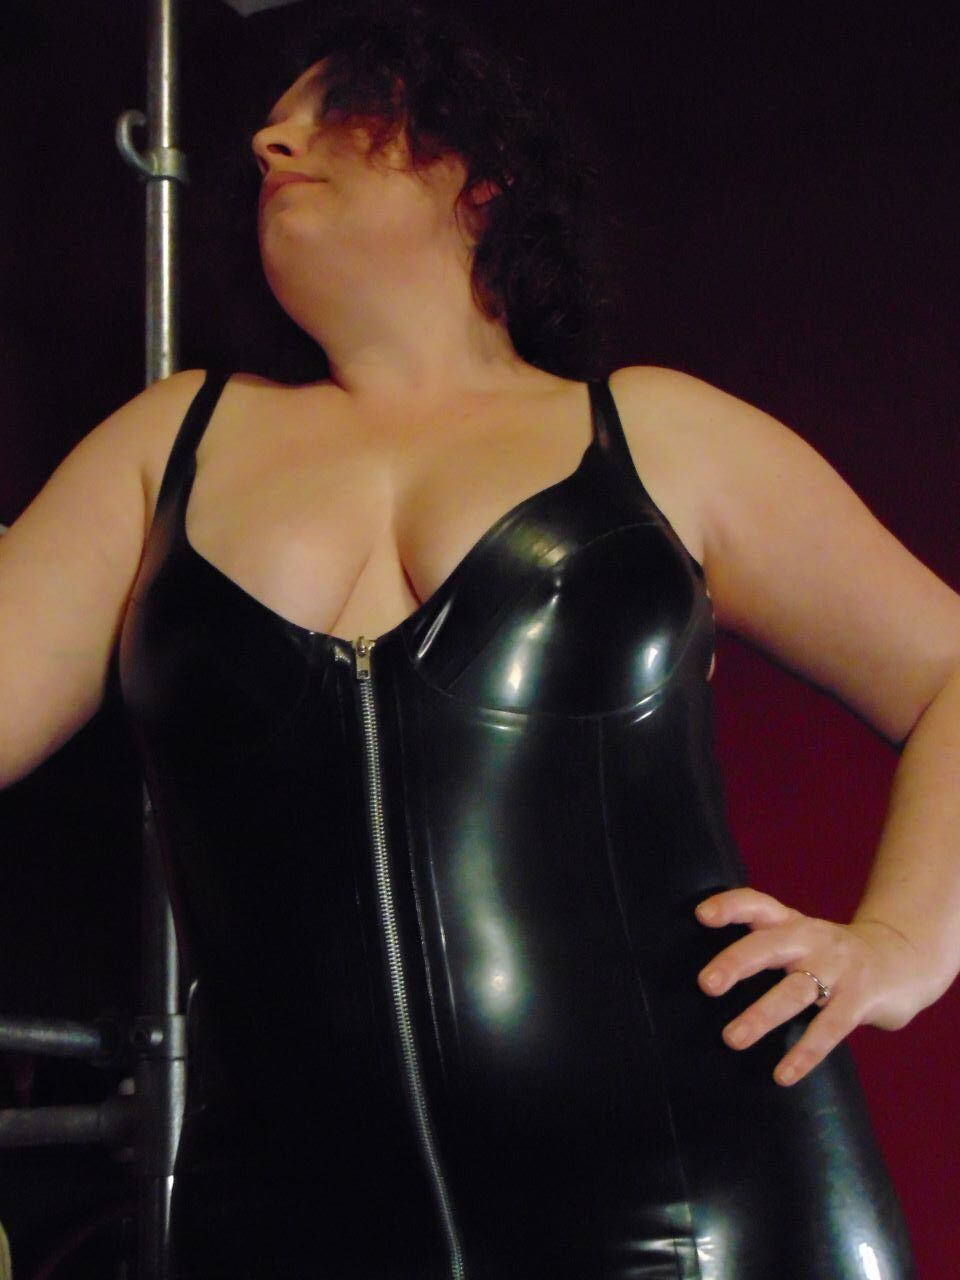 mistress lucy locker femdom goddess